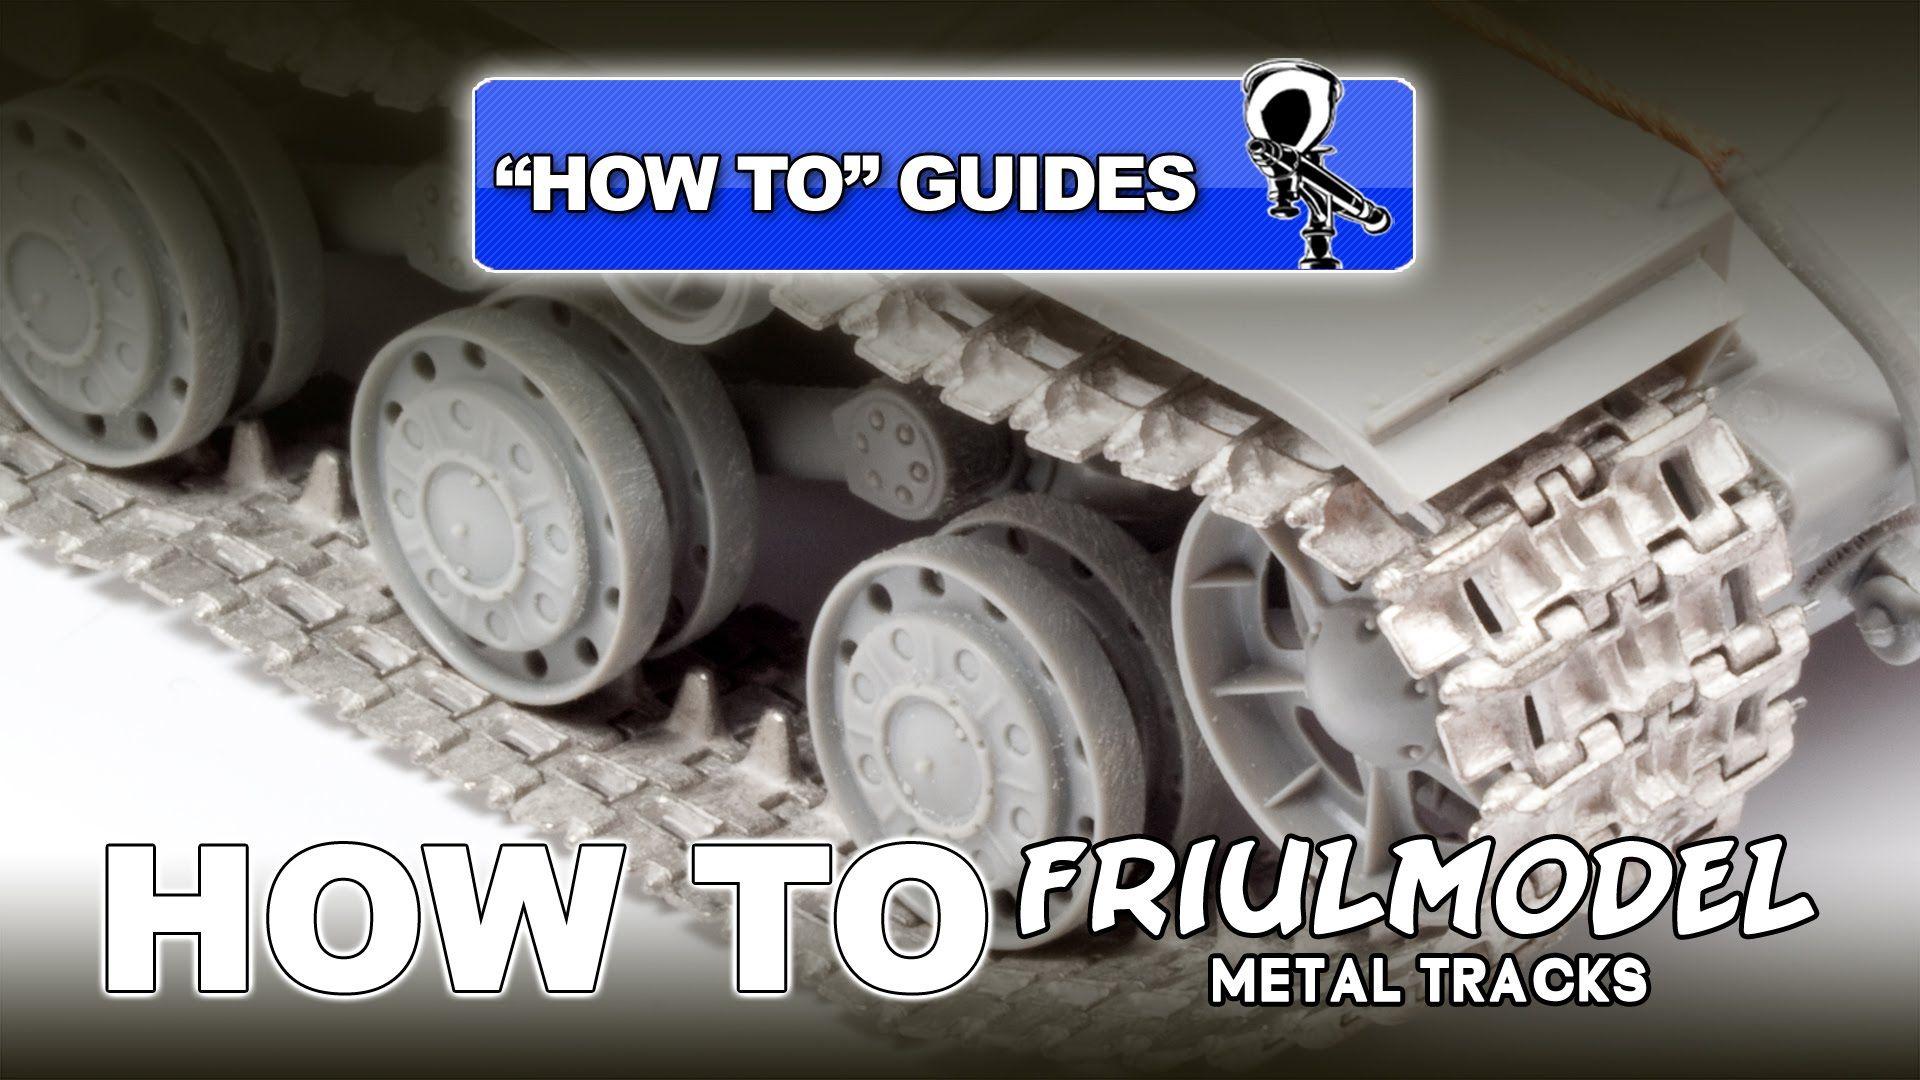 FRIULMODEL METAL TRACKS -